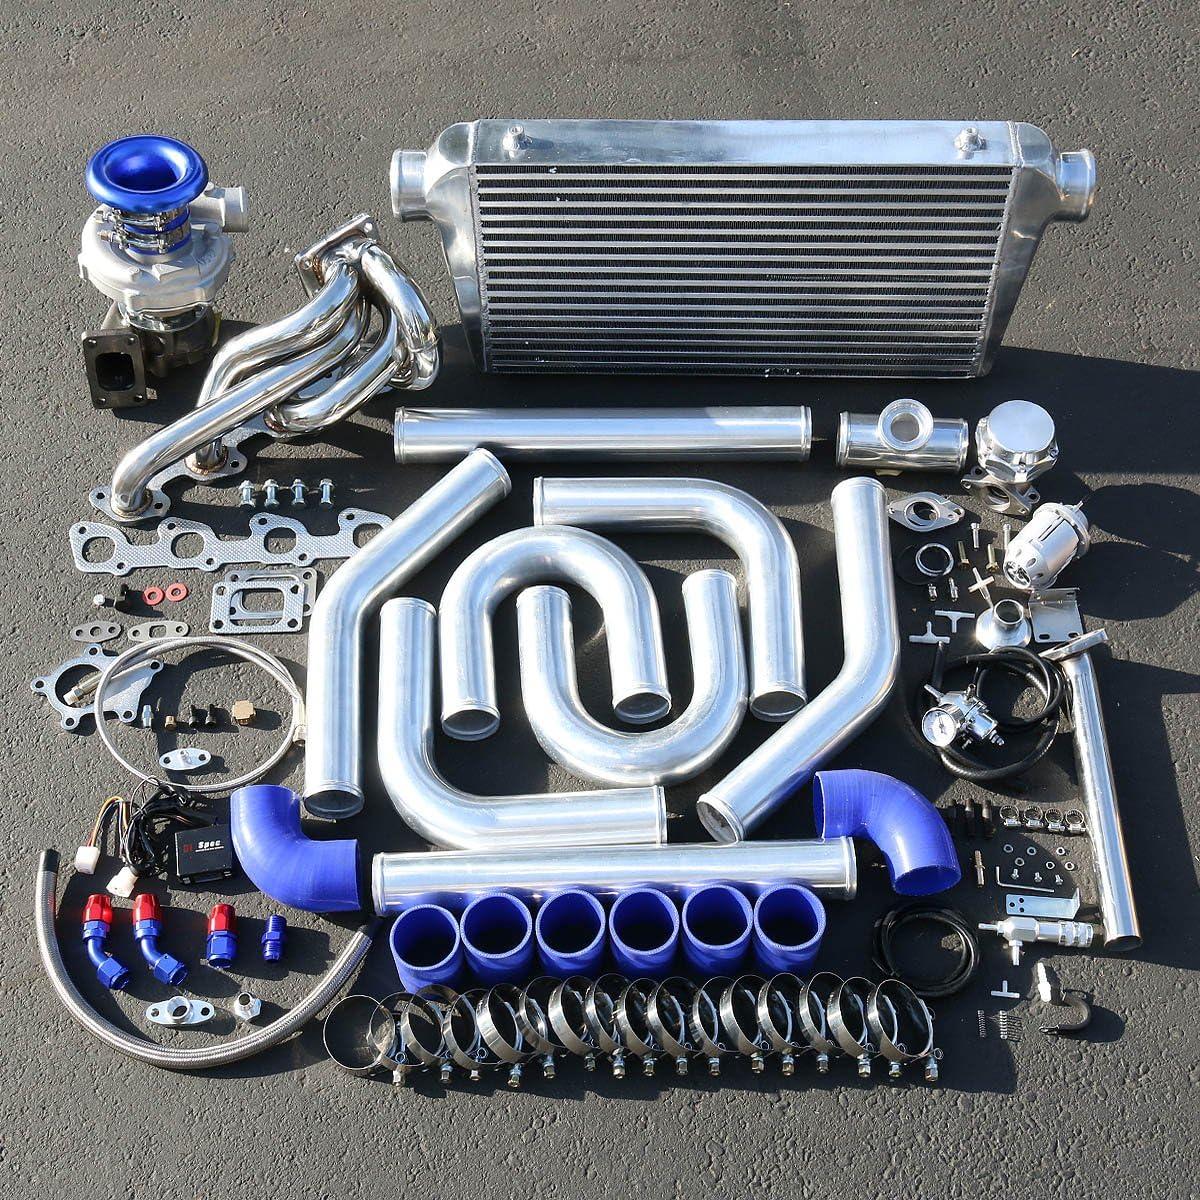 volvo 240 series high performance 15pcs t04e turbo upgrade installation kit amazon co uk car motorbike volvo 240 series high performance 15pcs